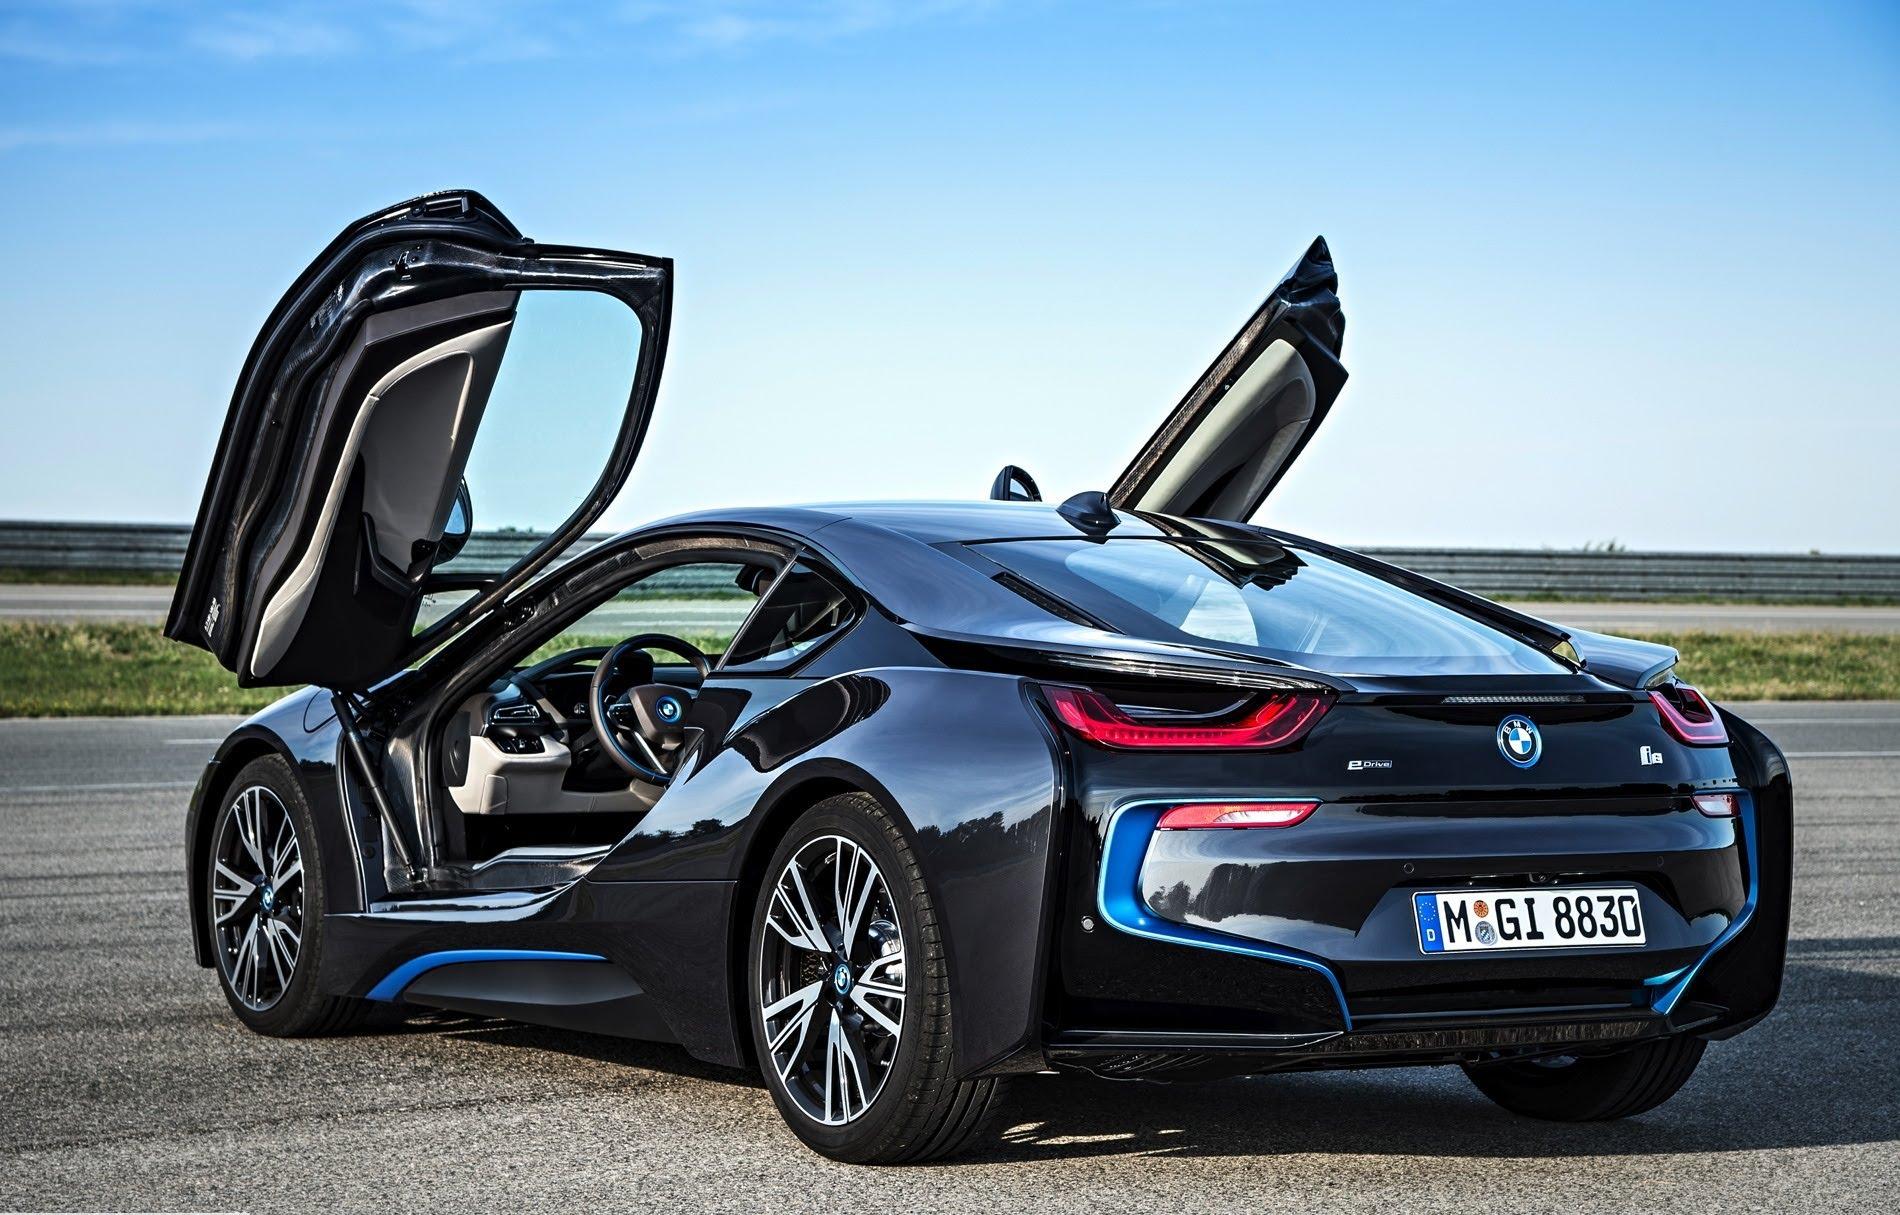 BMW i8. Το απόλυτο υβριδικό supercar είναι εδώ (video)